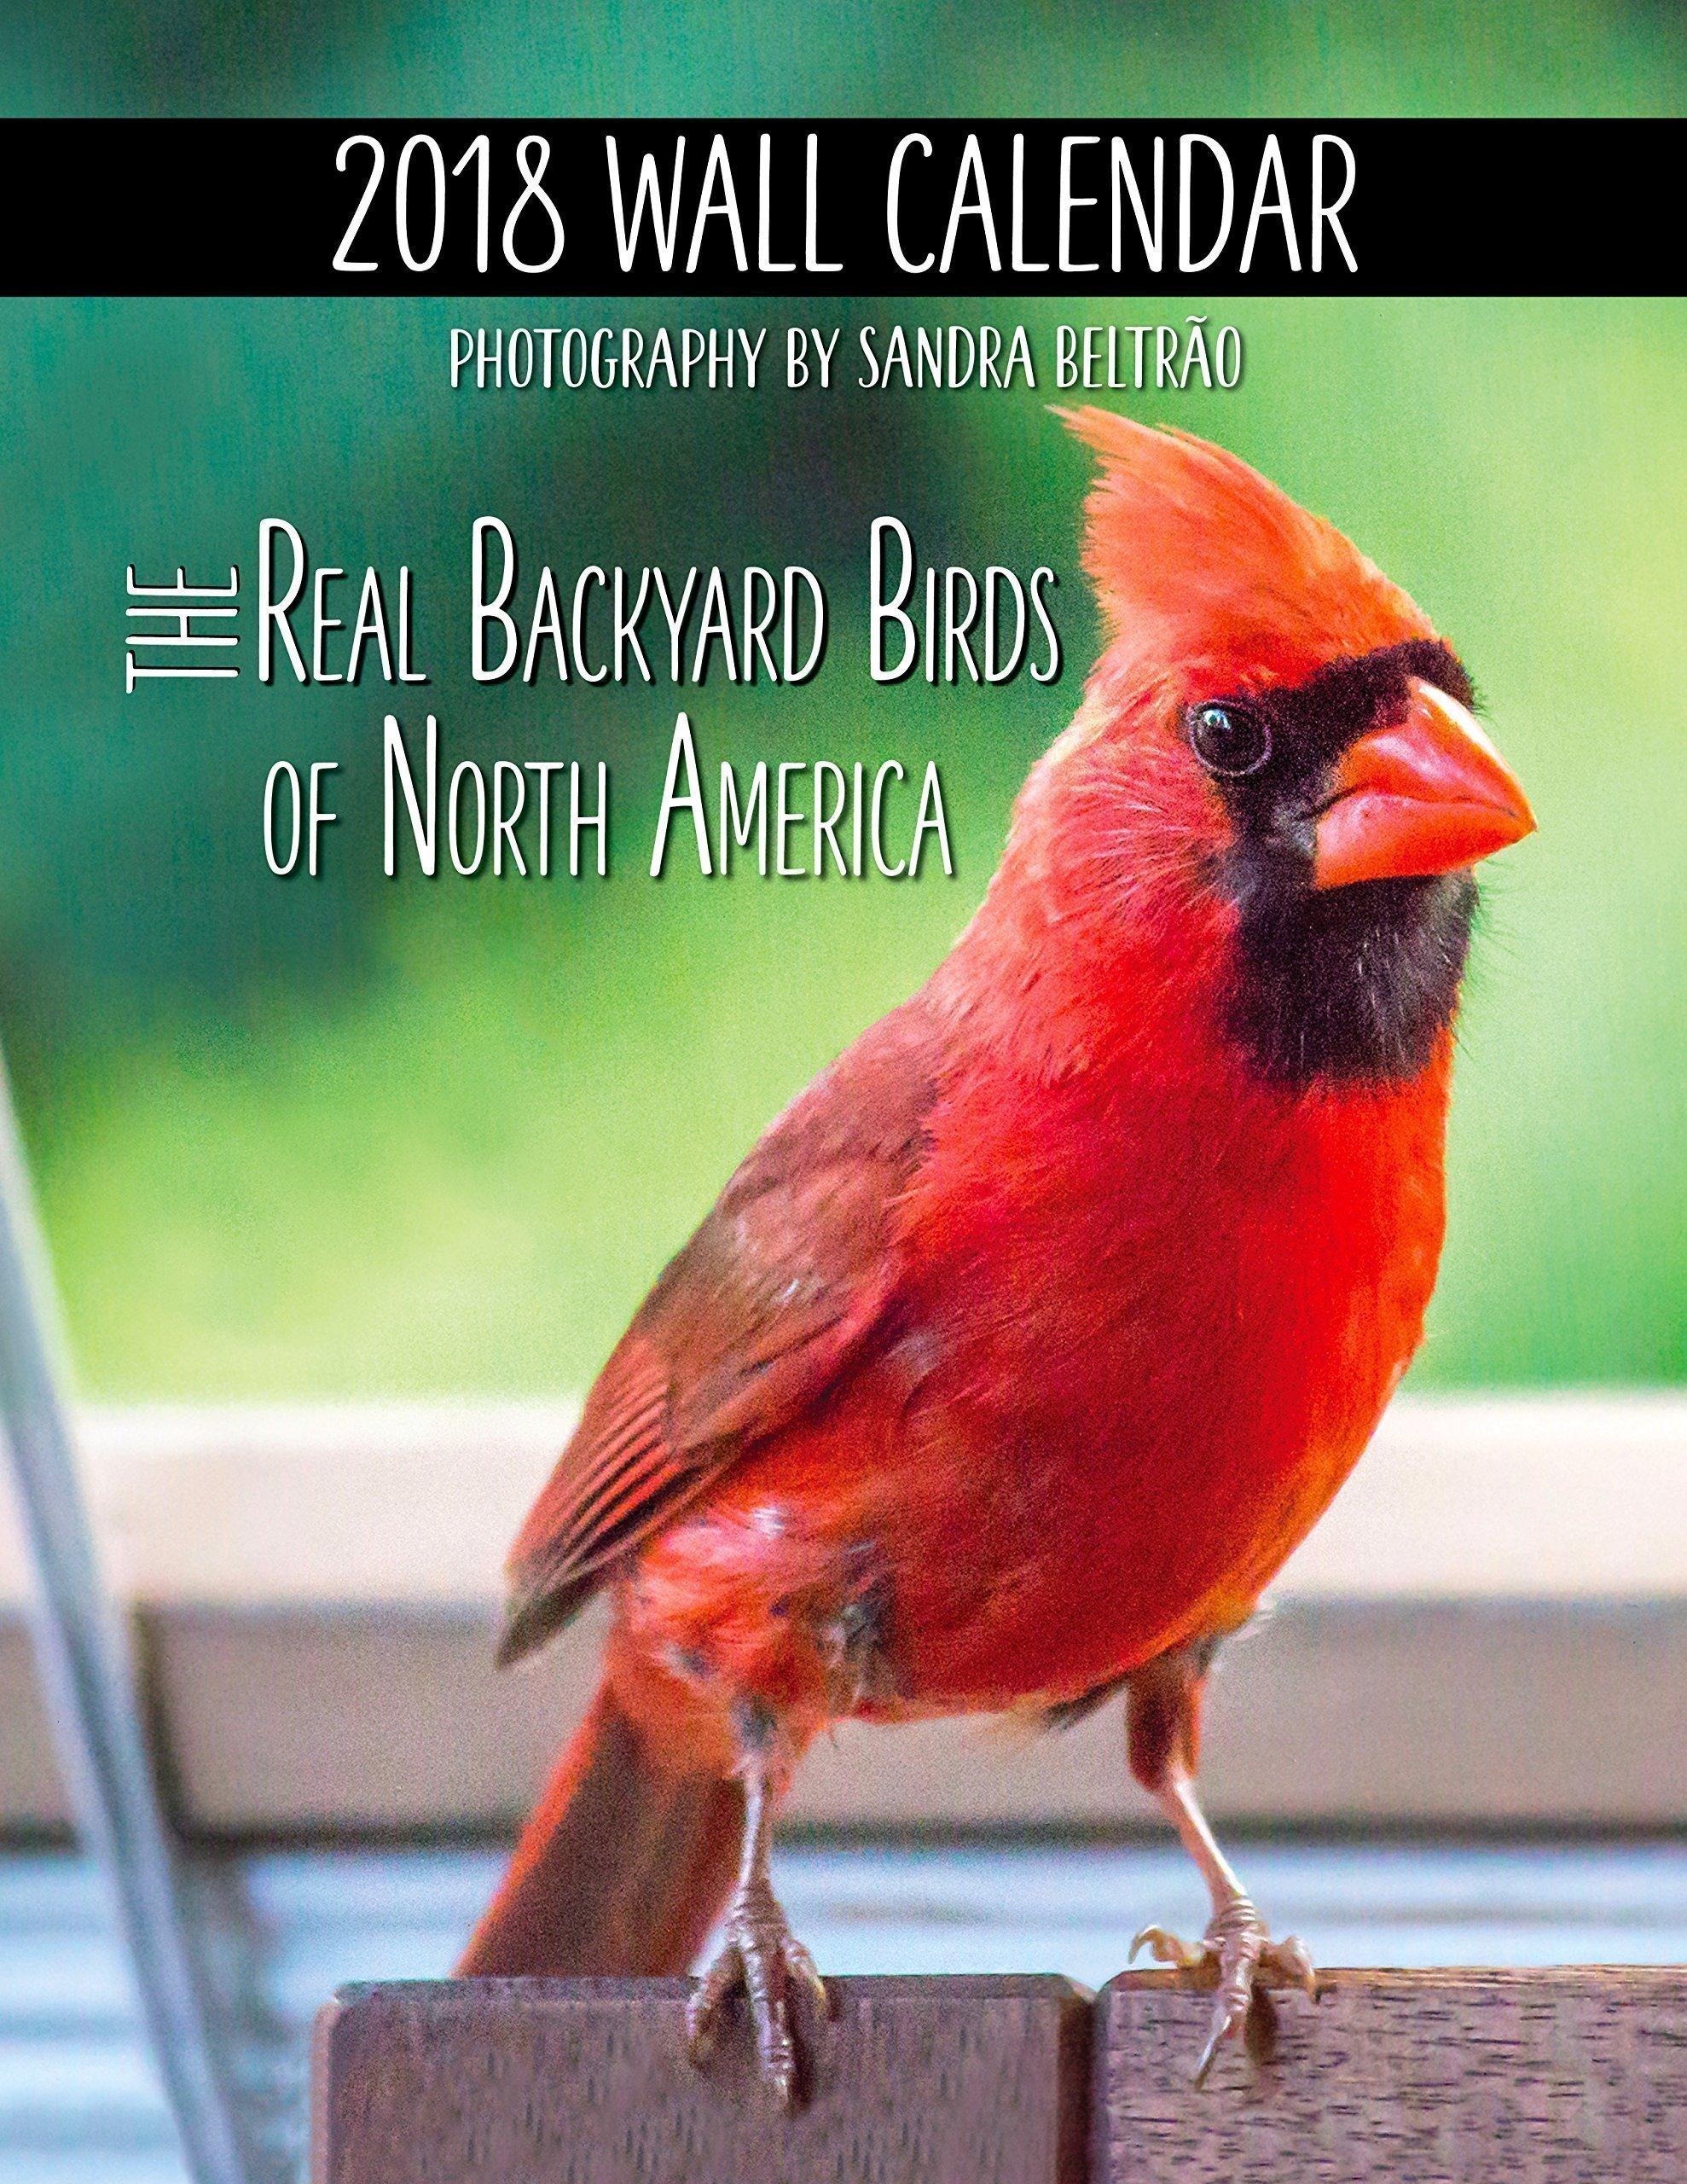 2018 Wall Calendar (The Real Backyard Birds of North America)